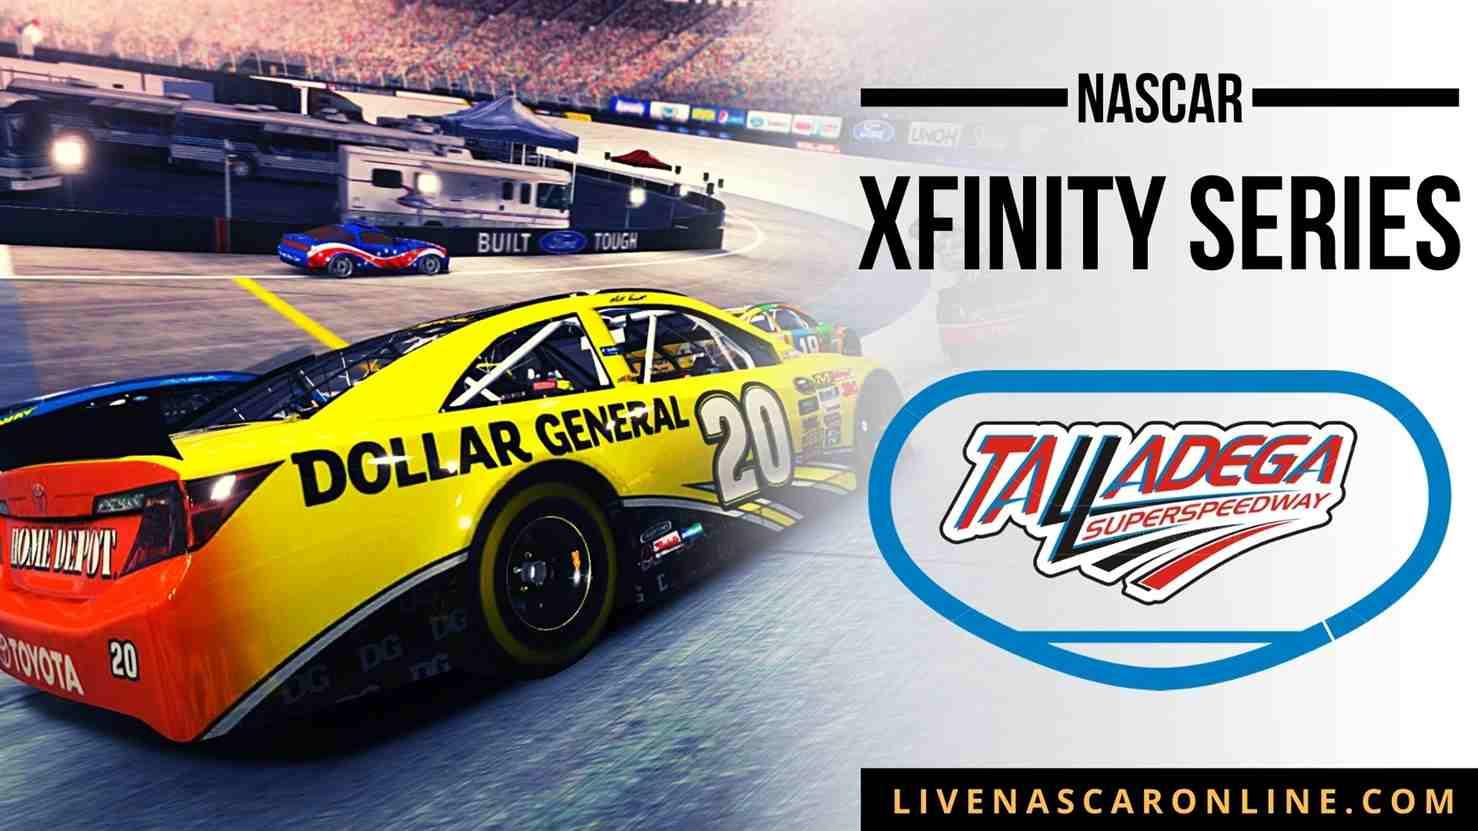 NASCAR Xfinity Race at Talladega Live Stream 2021